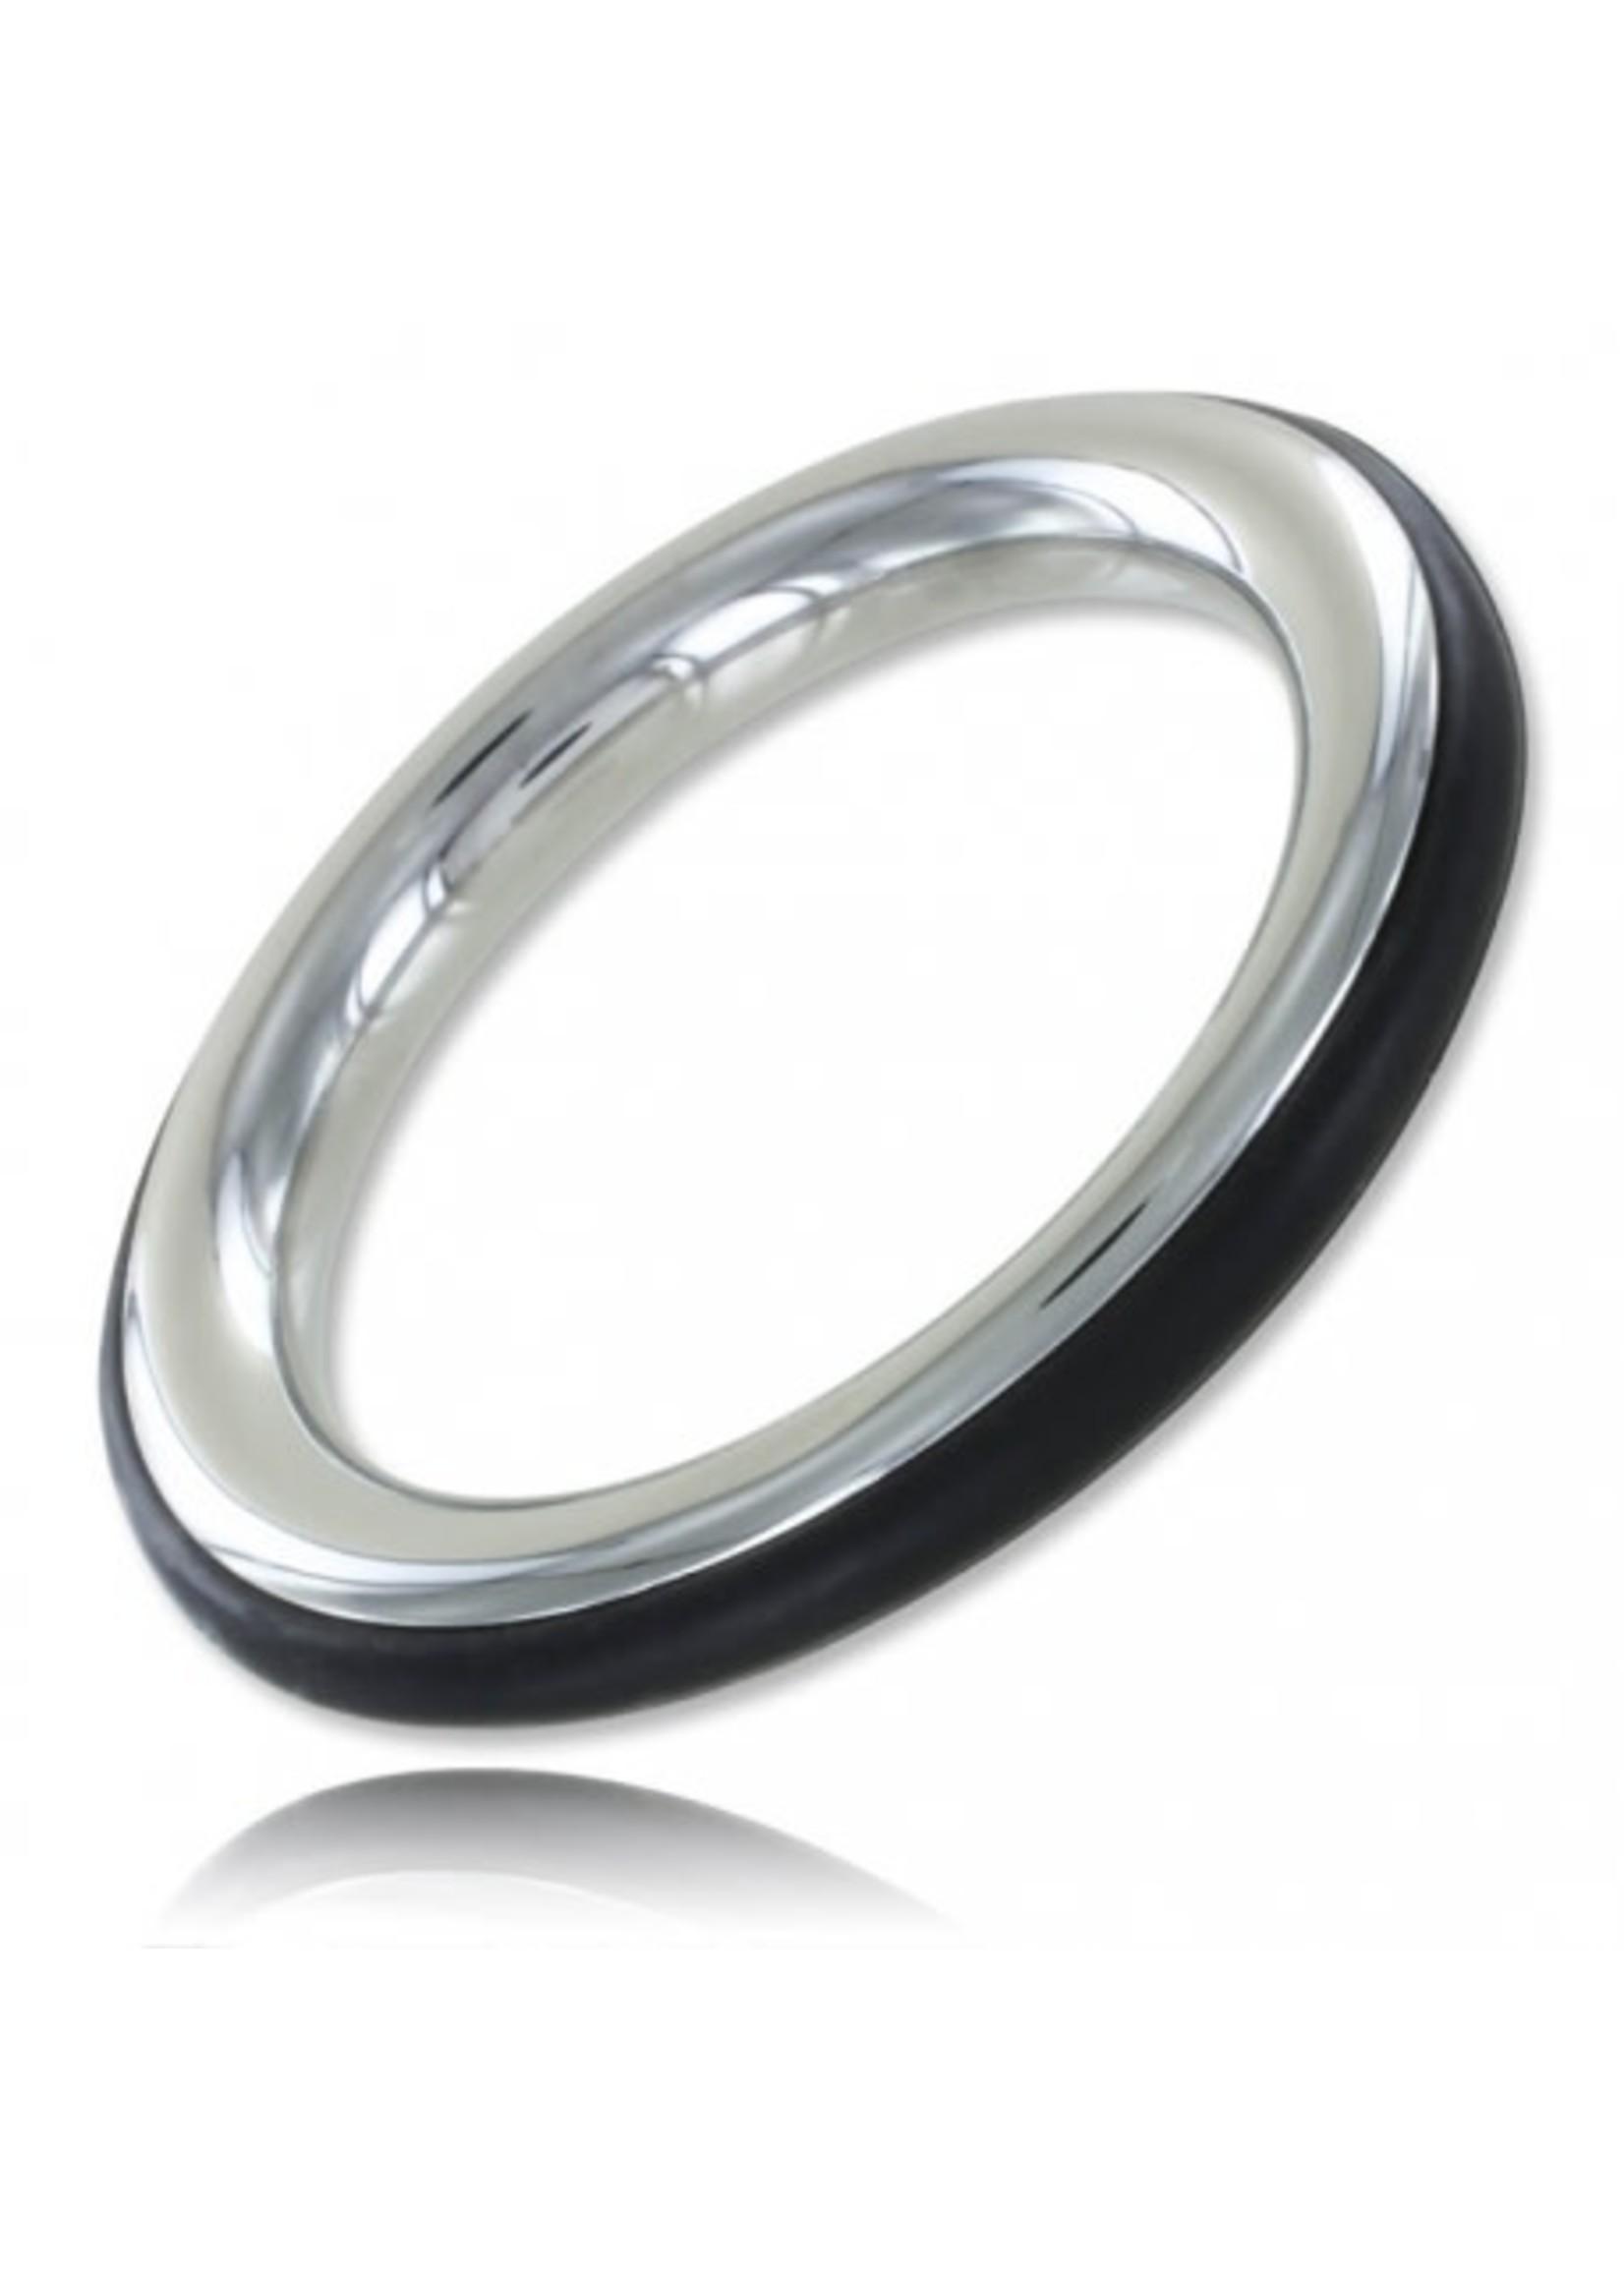 Dark Line Ze Cazzo Cock Ring